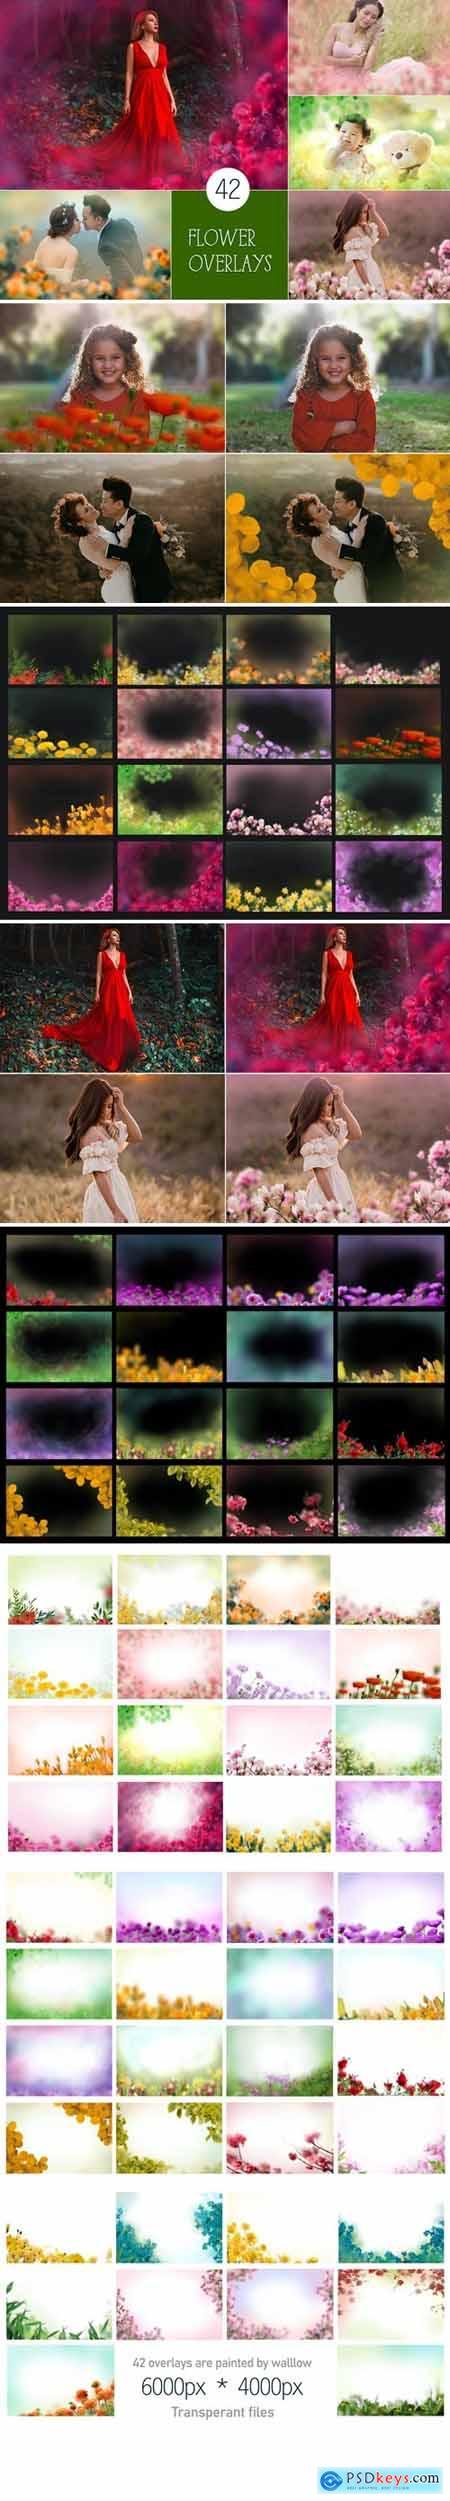 42 Painted Flowers photo Overlays